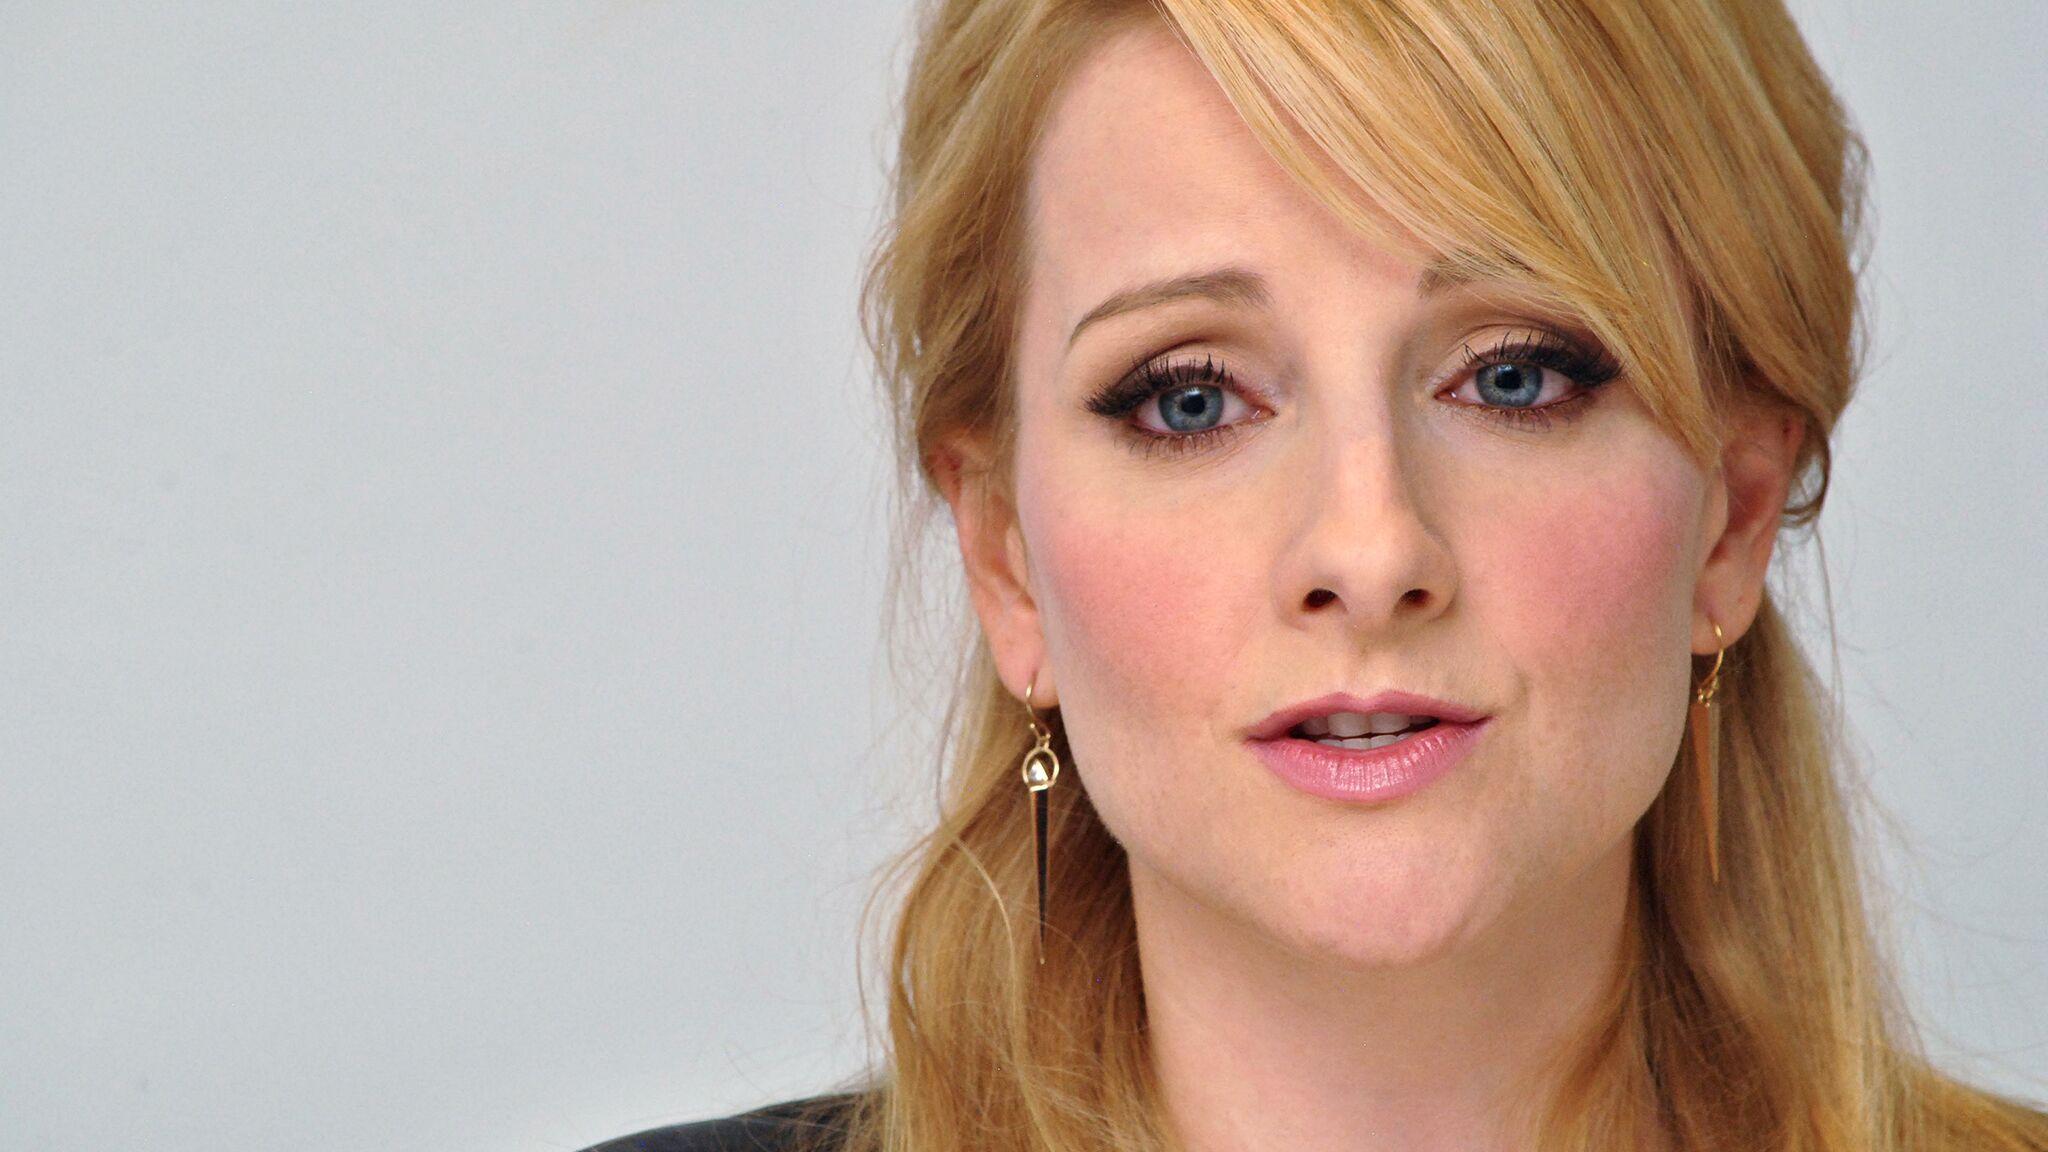 Melissa Rauch Big Bang Theory Enceinte Elle évoque Avec émotion